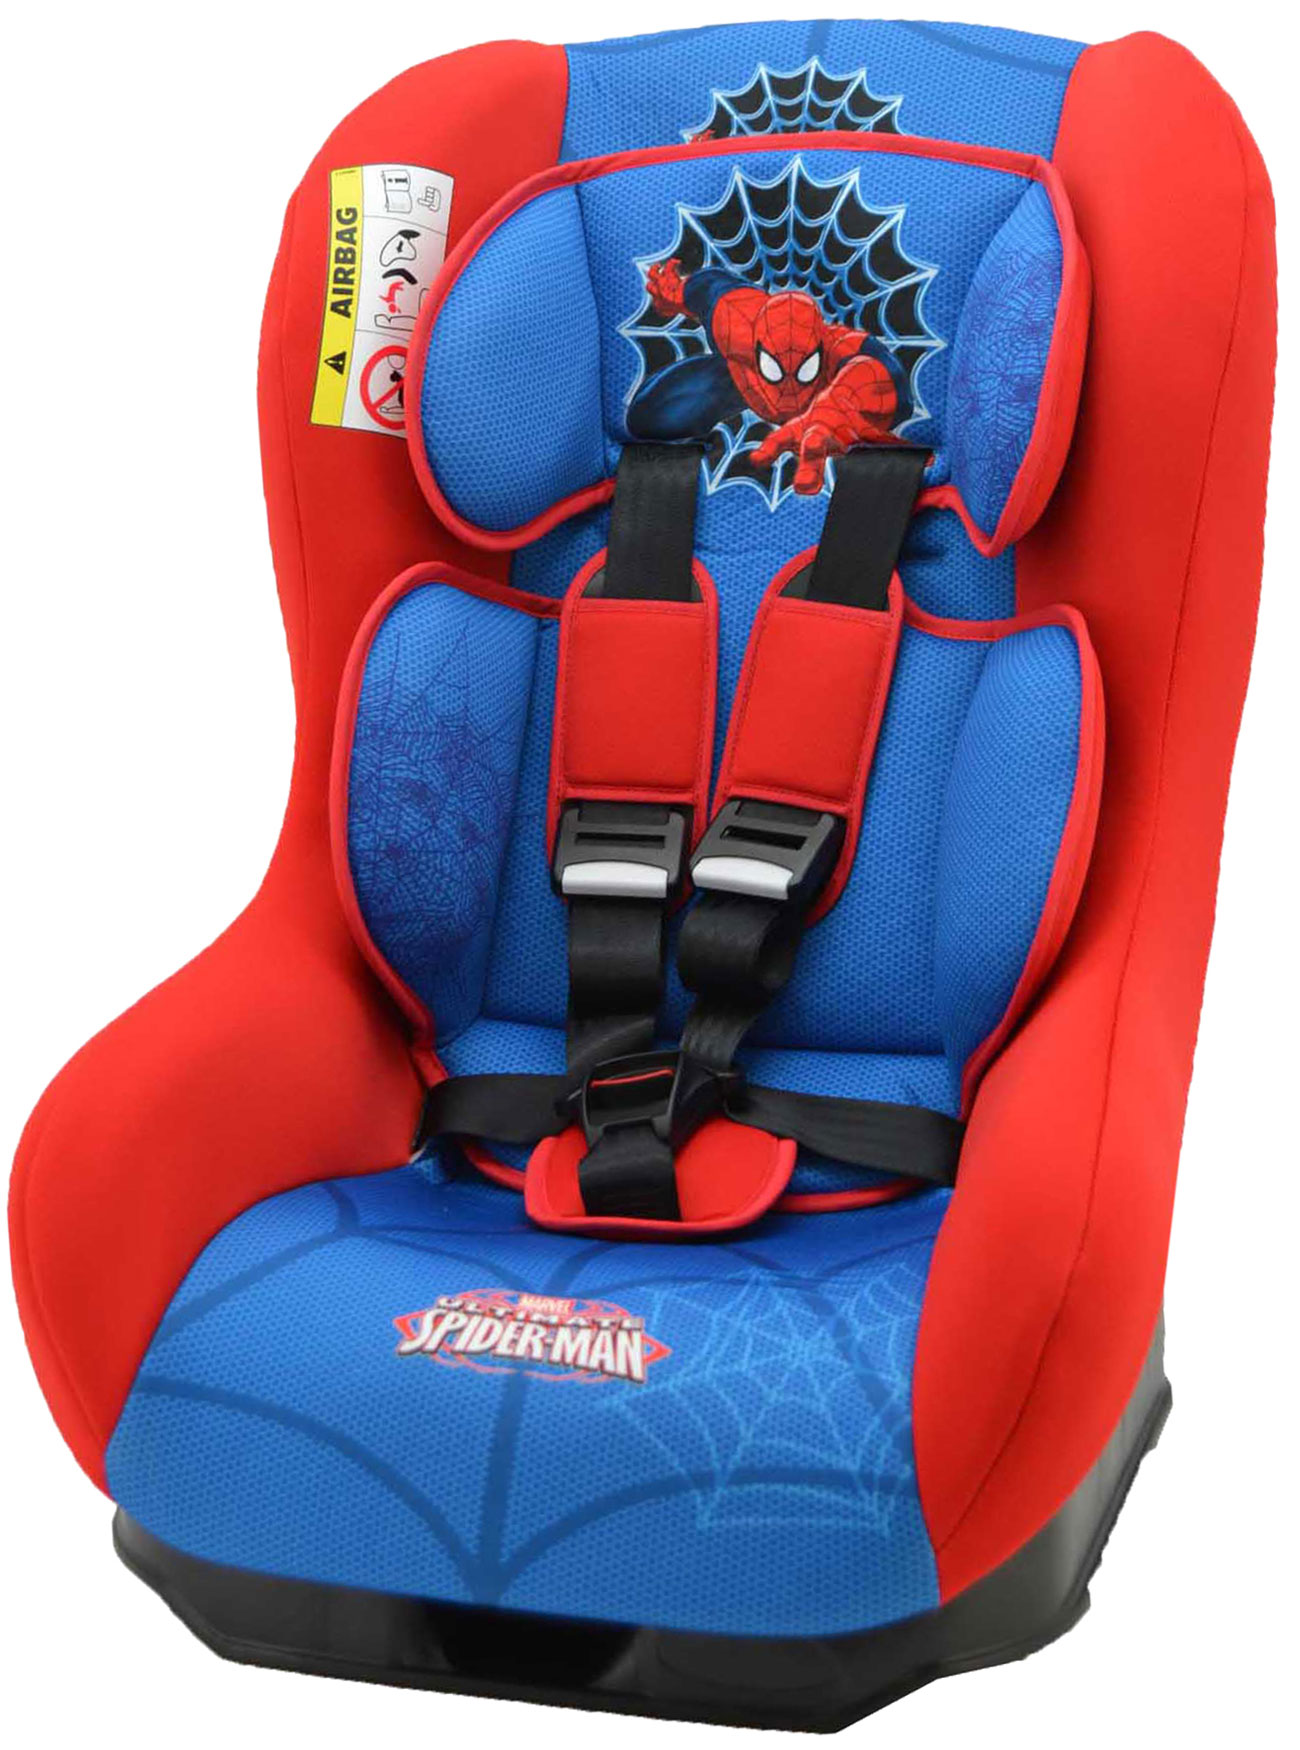 nania marvel spiderman fahrer gruppe 0 1 autositz sicherheit baby kind neu ebay